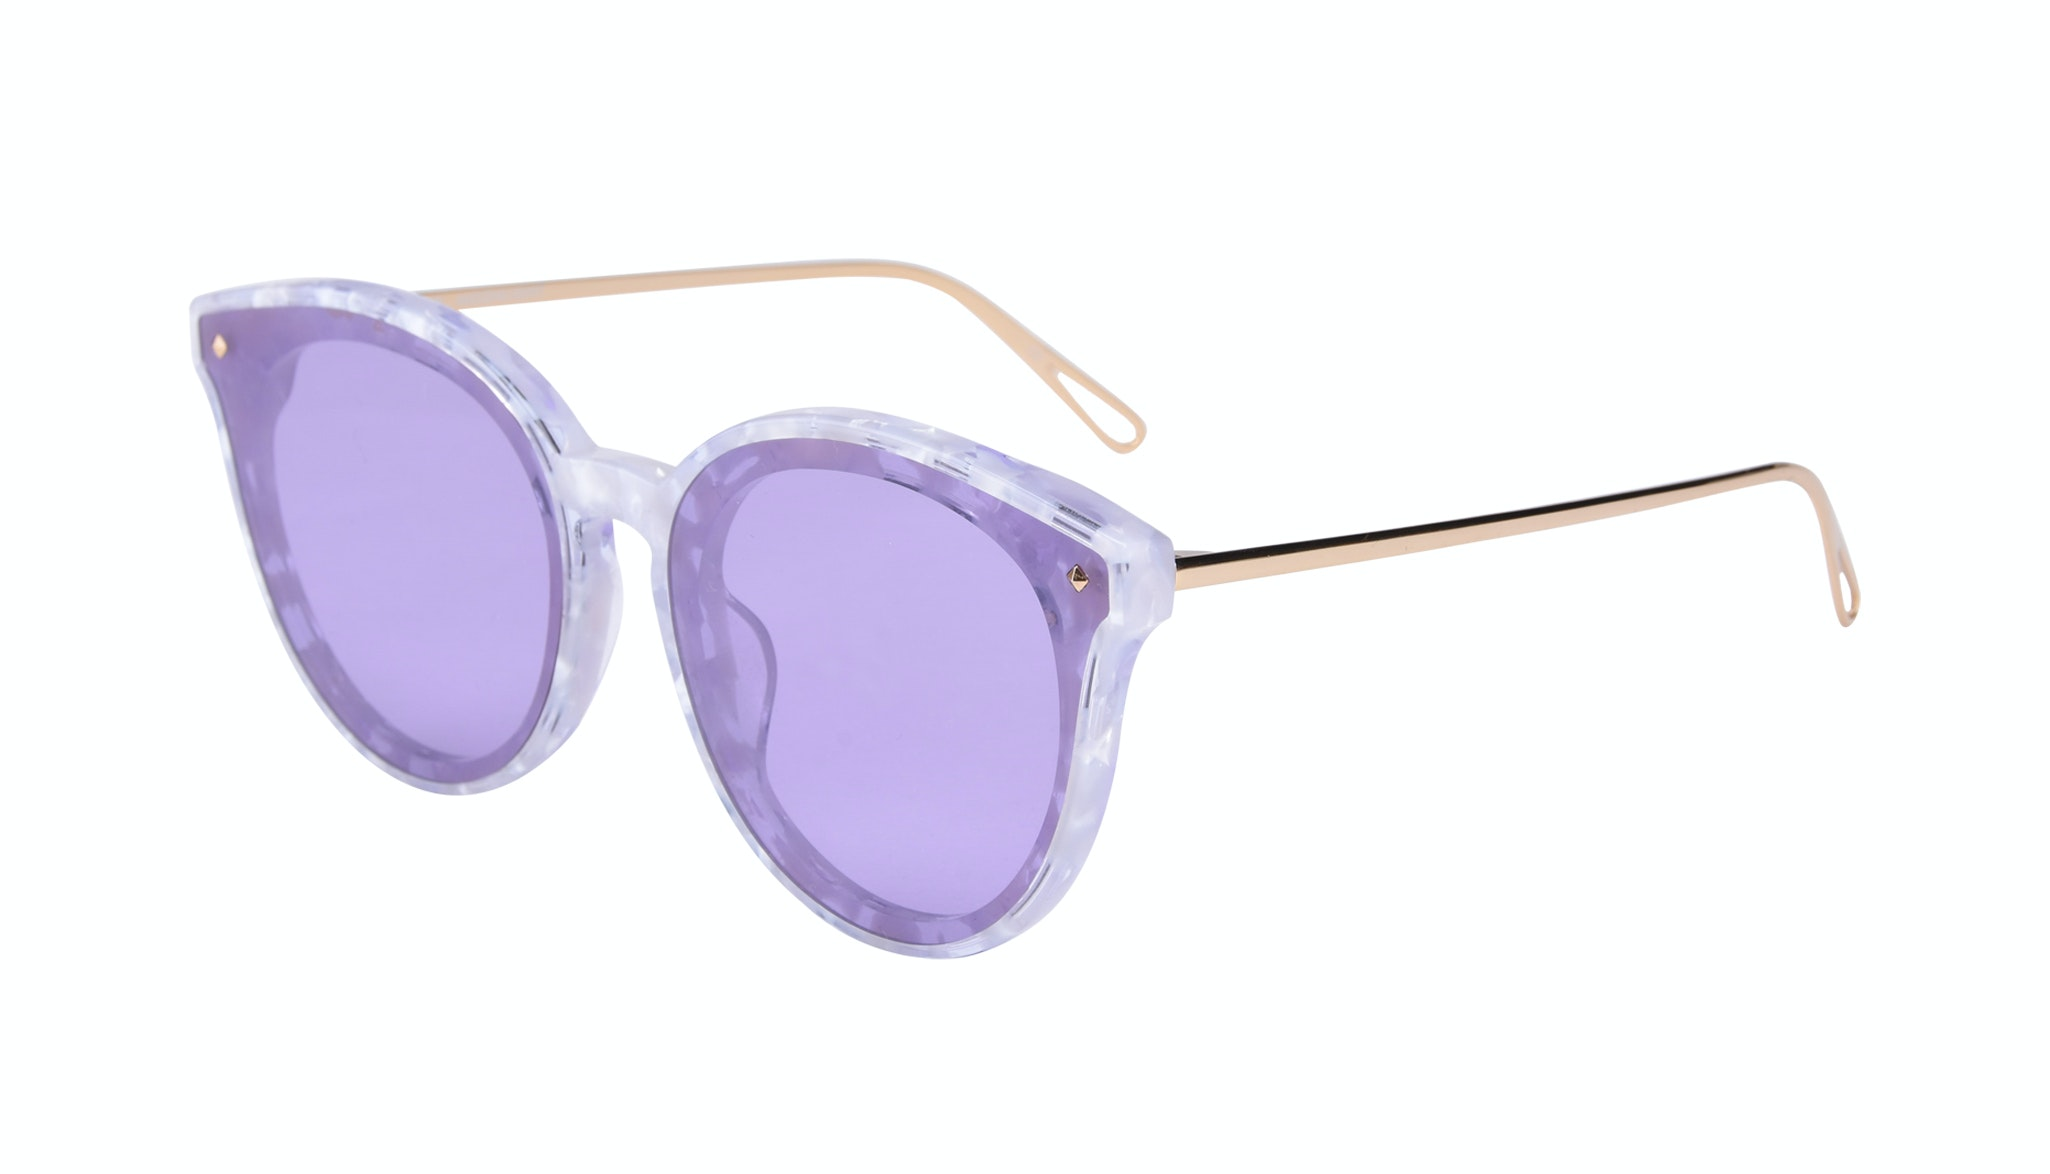 Affordable Fashion Glasses Cat Eye Sunglasses Women Icone Moonlight Tilt